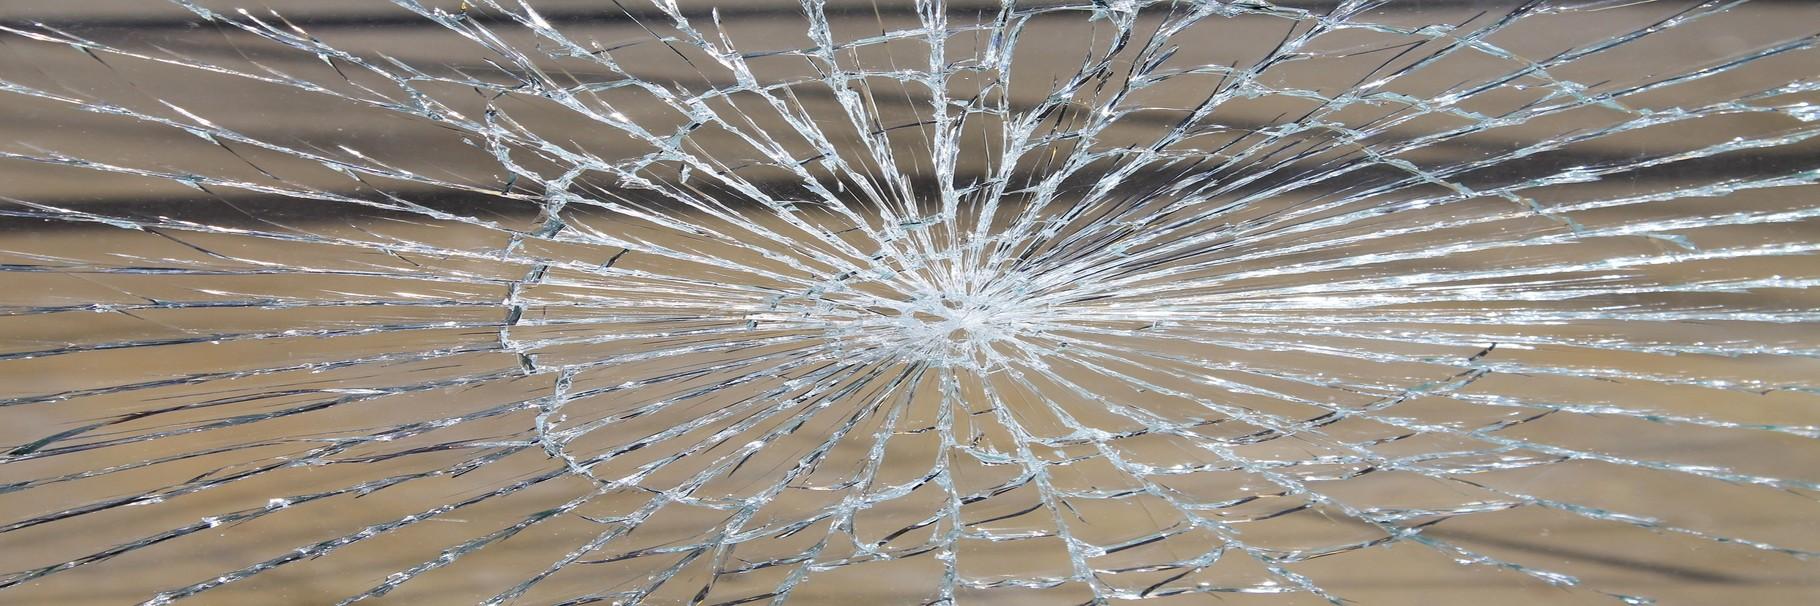 Locksmiths La Clau Màgica, Crystals 24 hours in Barcelona